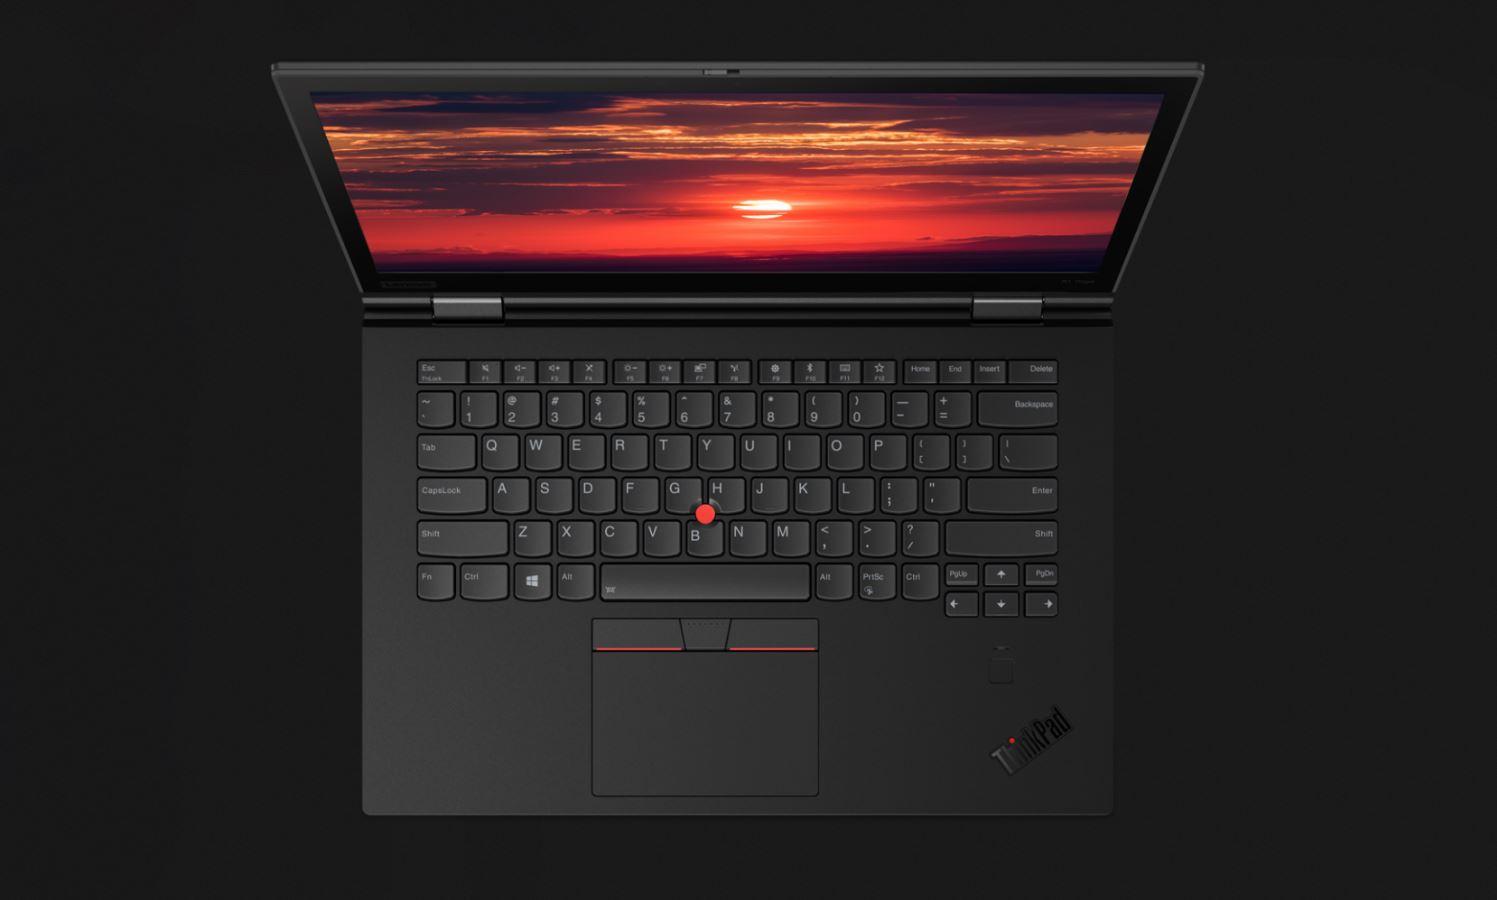 Lenovo Reveals Next Gen Thinkpad X1 Yoga With Wake On